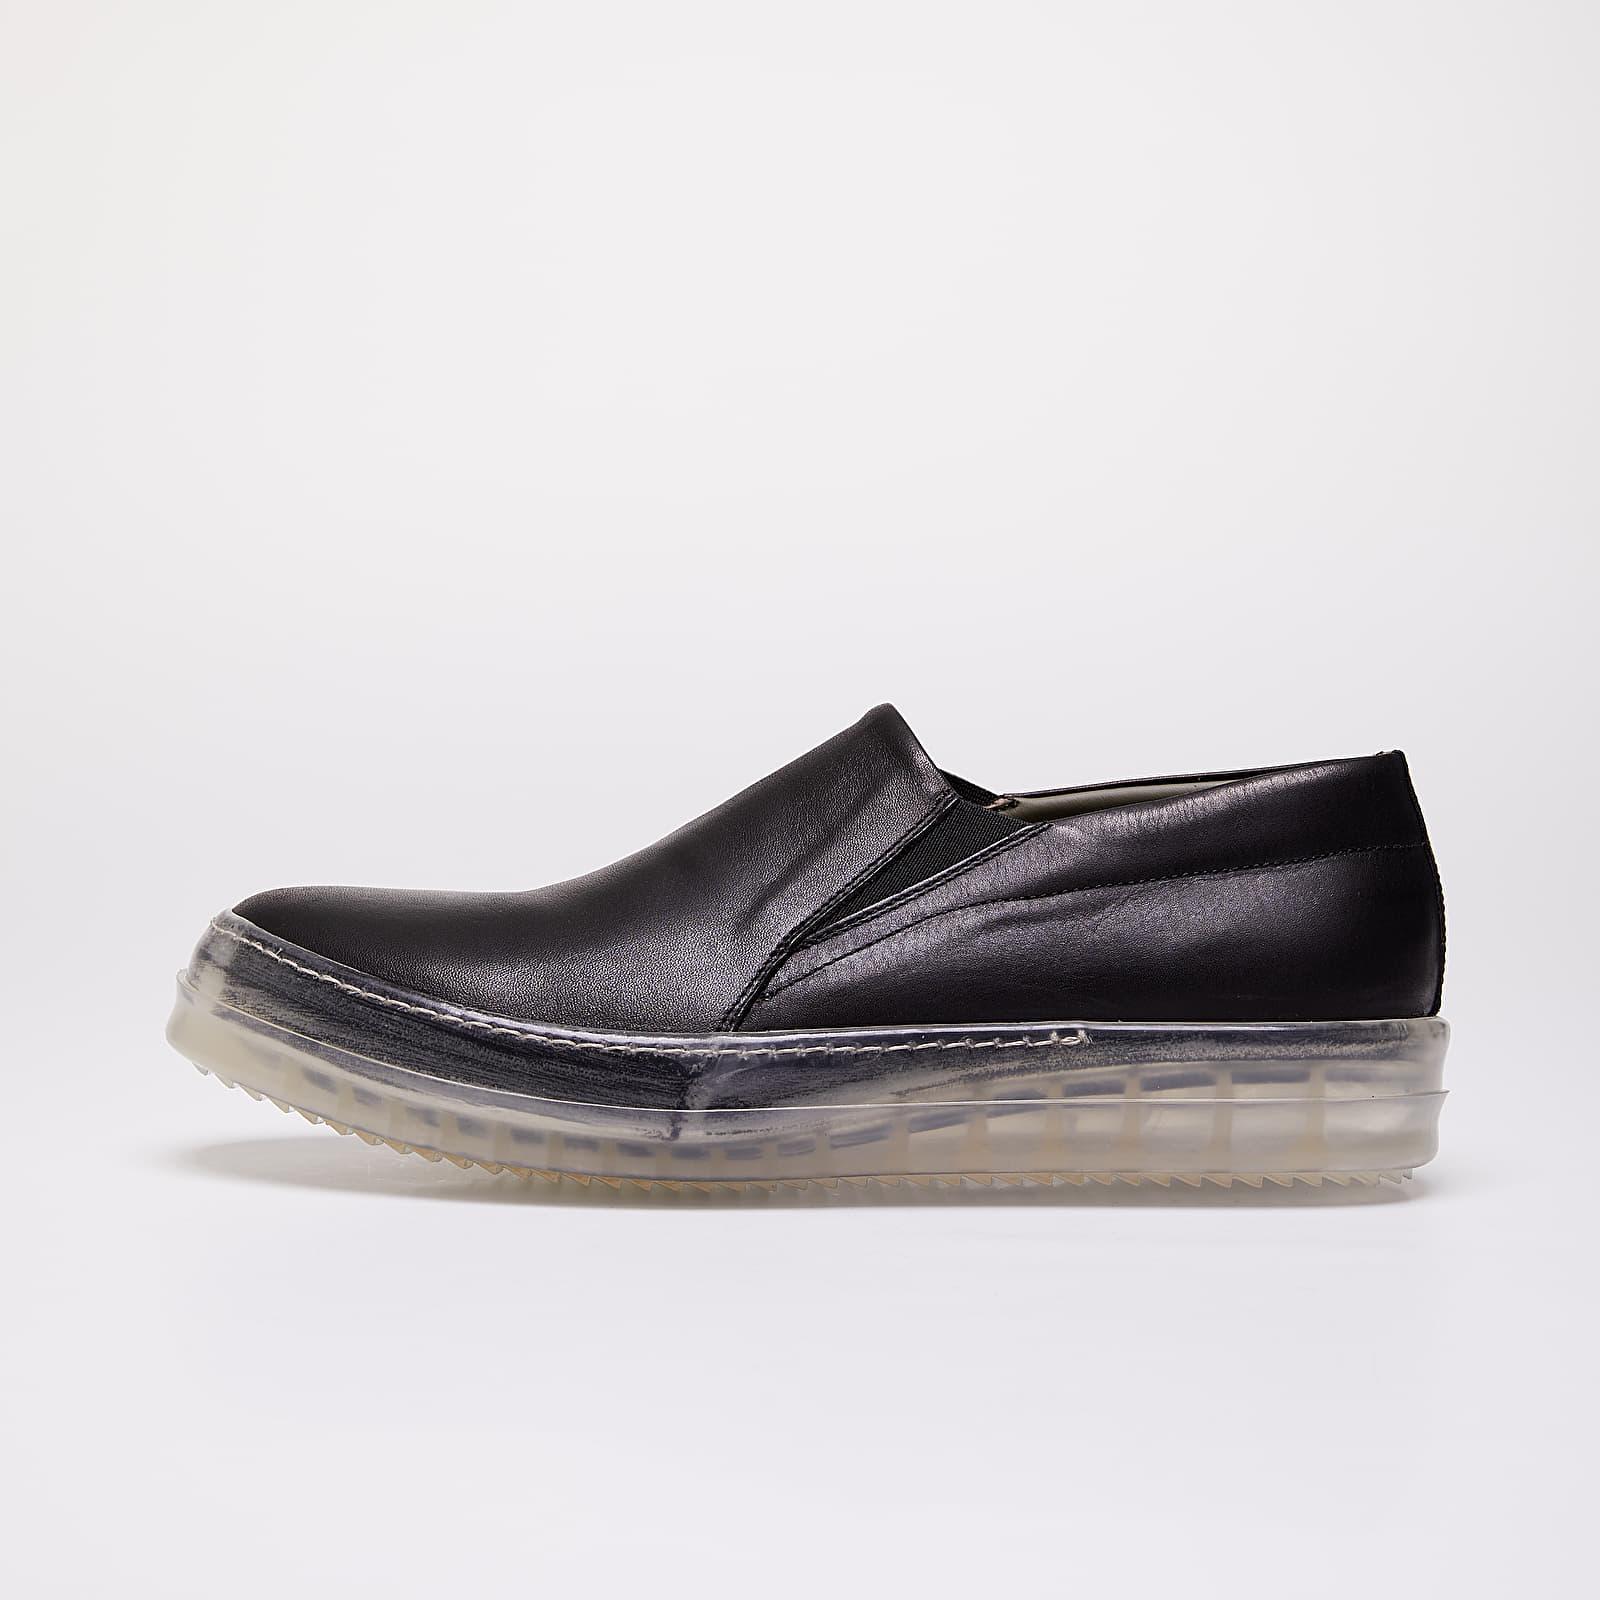 Chaussures et baskets homme Rick Owens No Cap Boat Sneakers Black